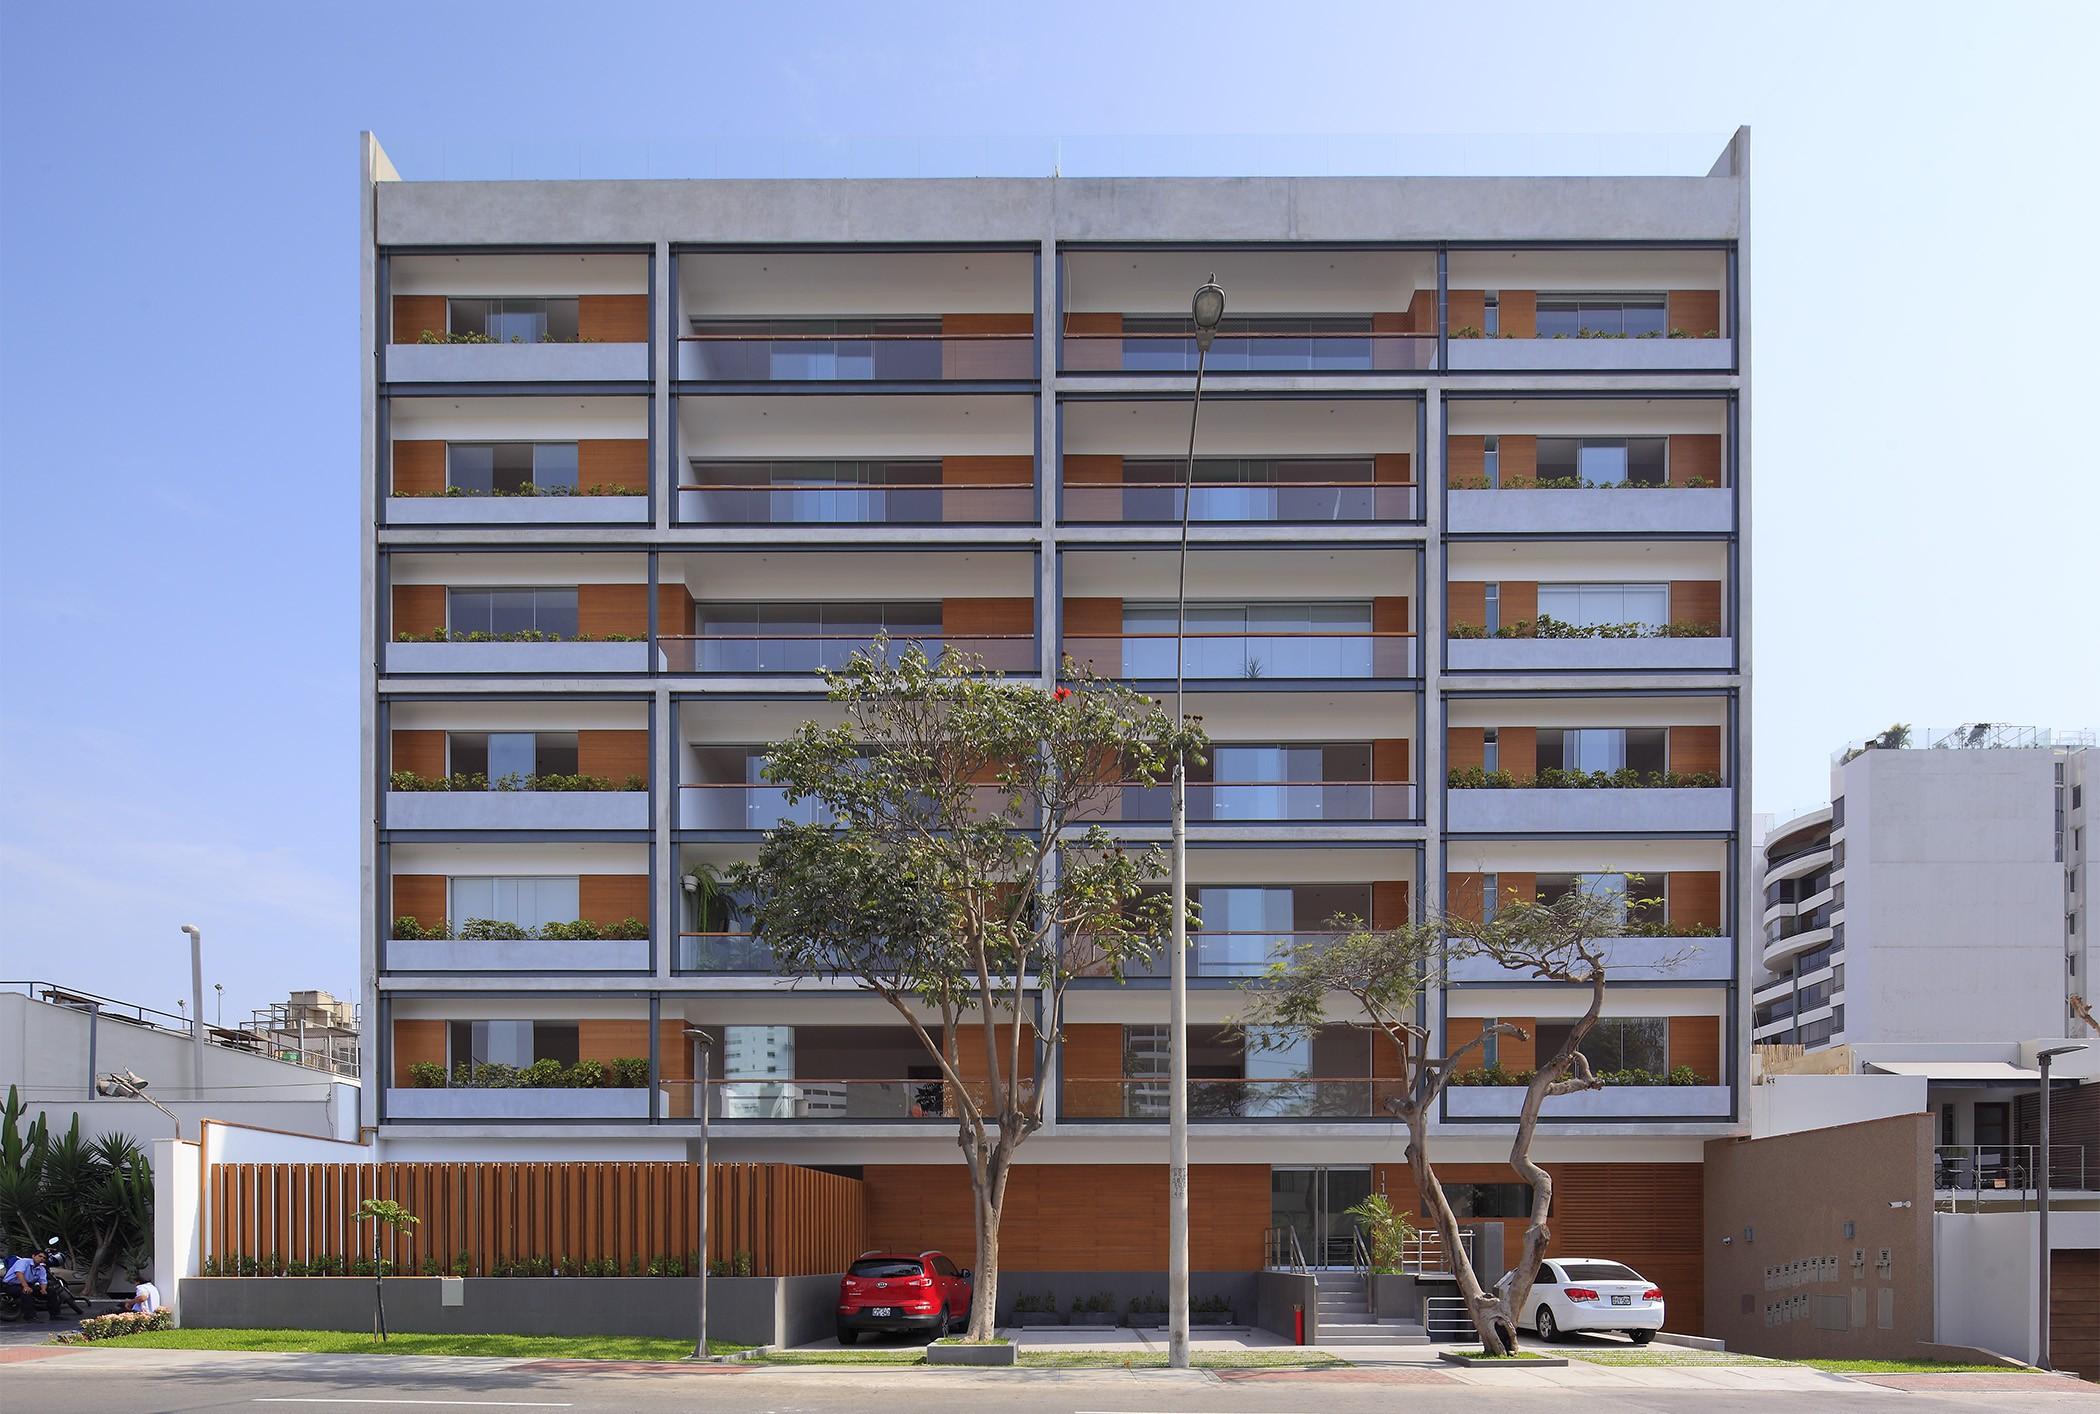 Edificio Multifamiliar Basadre, San Isidro, Lima, Perú